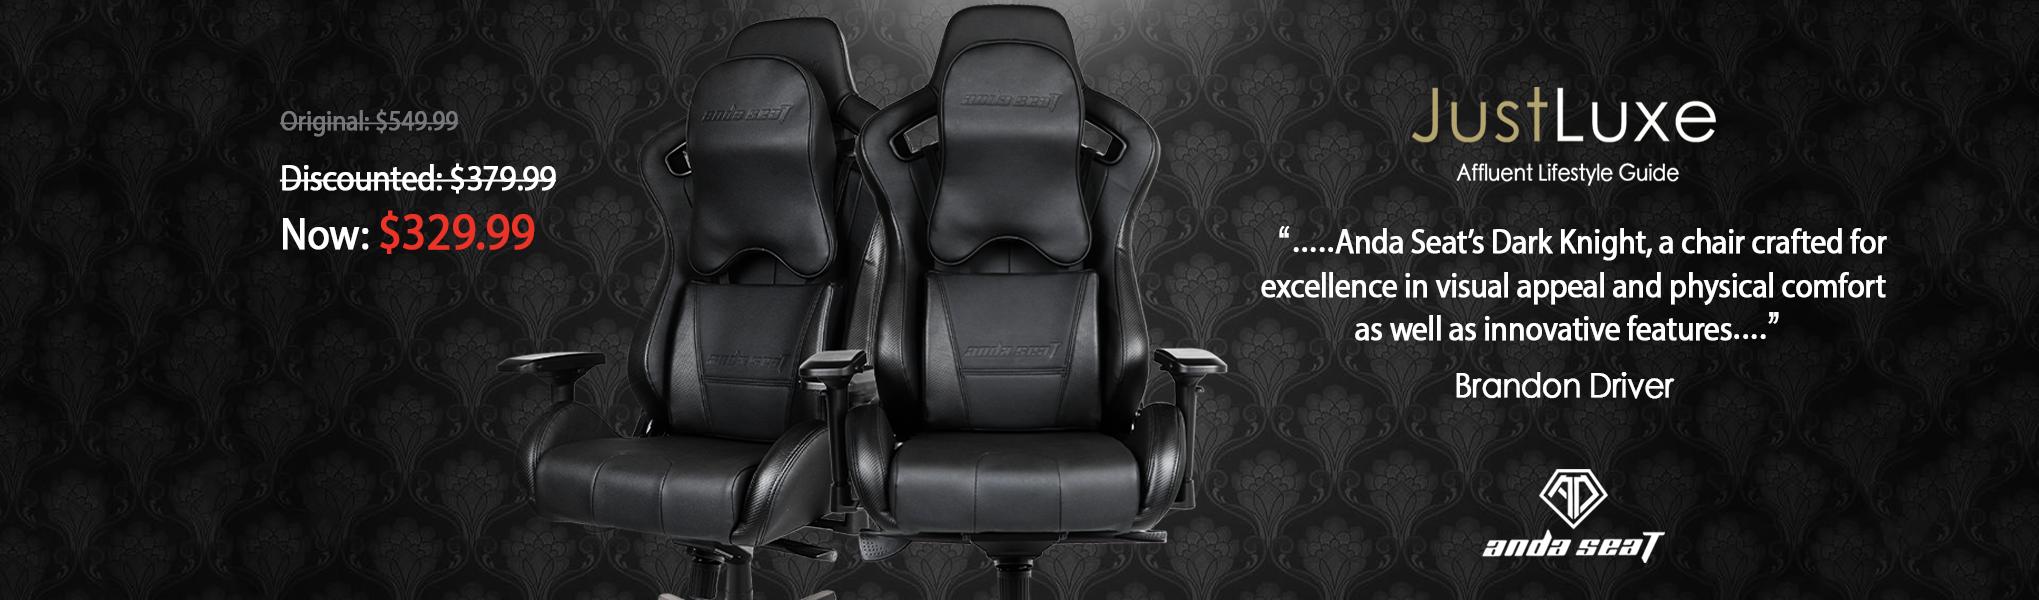 Dark Knight pc Gaming Chair for big guys